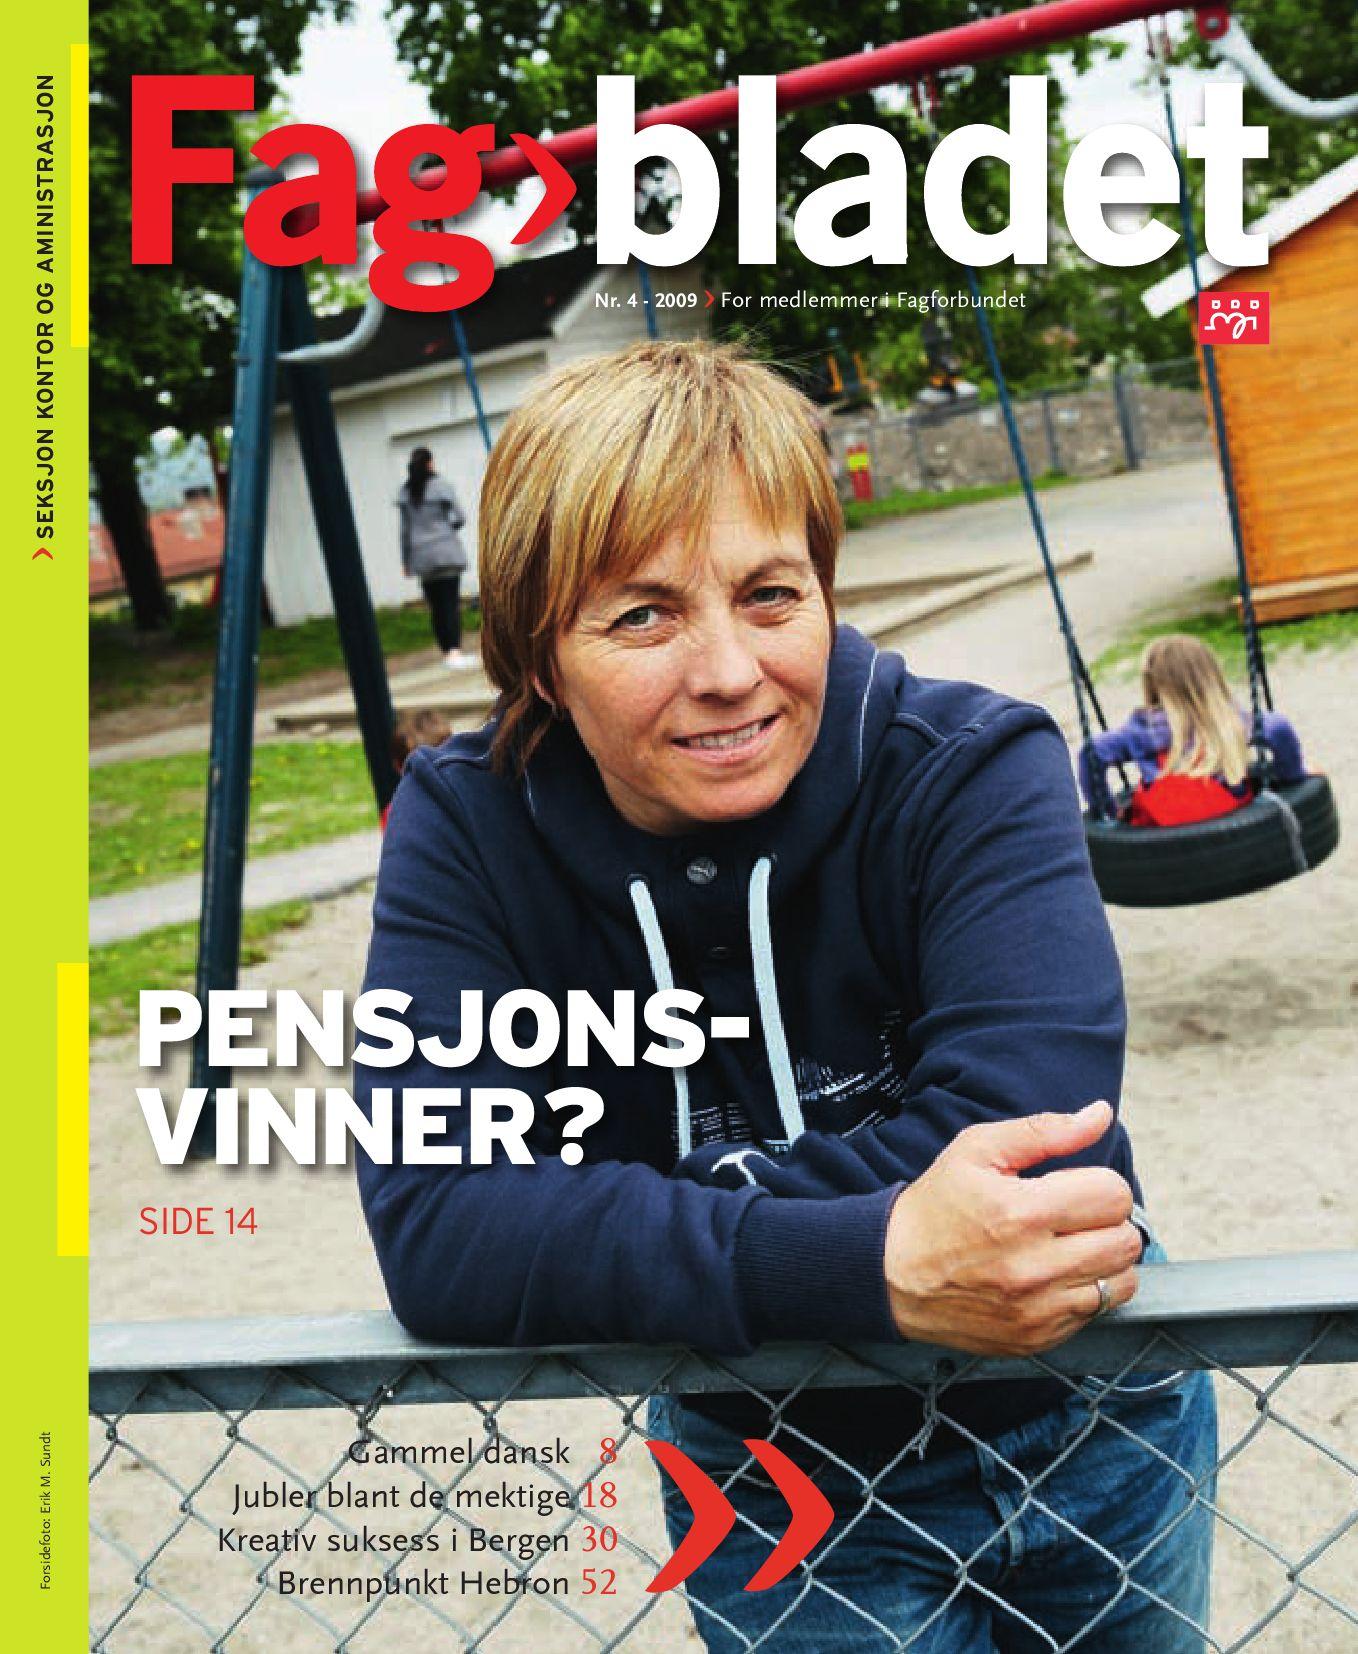 7312a05c6 Fagbladet 2009 04 - KON by Fagbladet - issuu